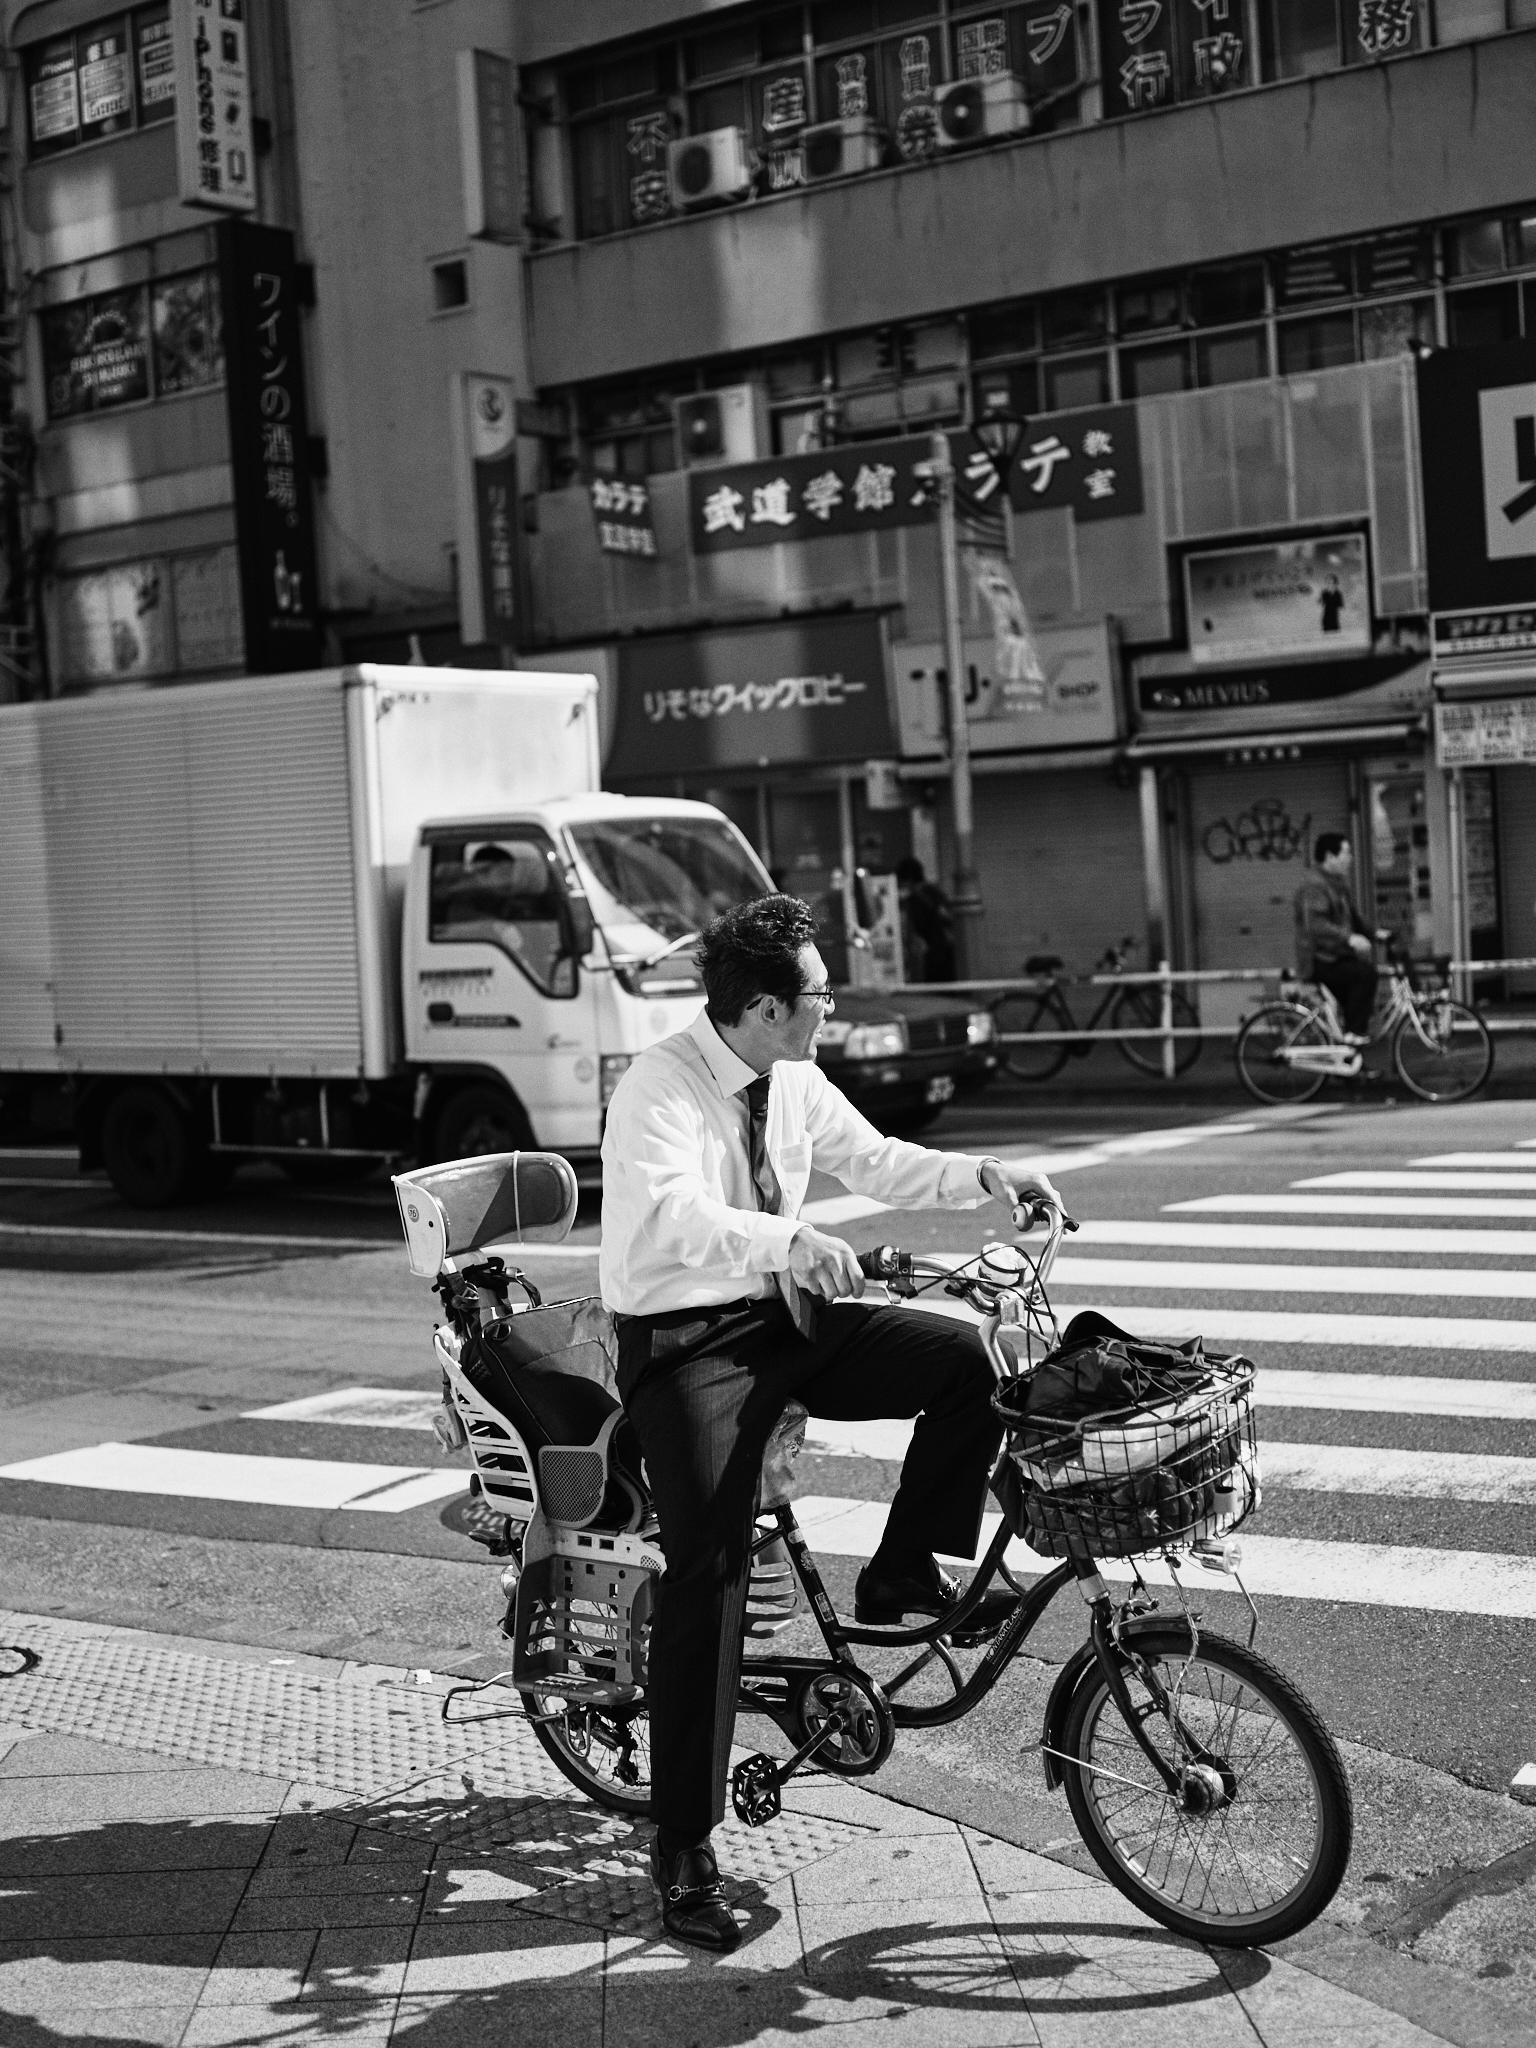 Tokyo street photography guide, gotanda